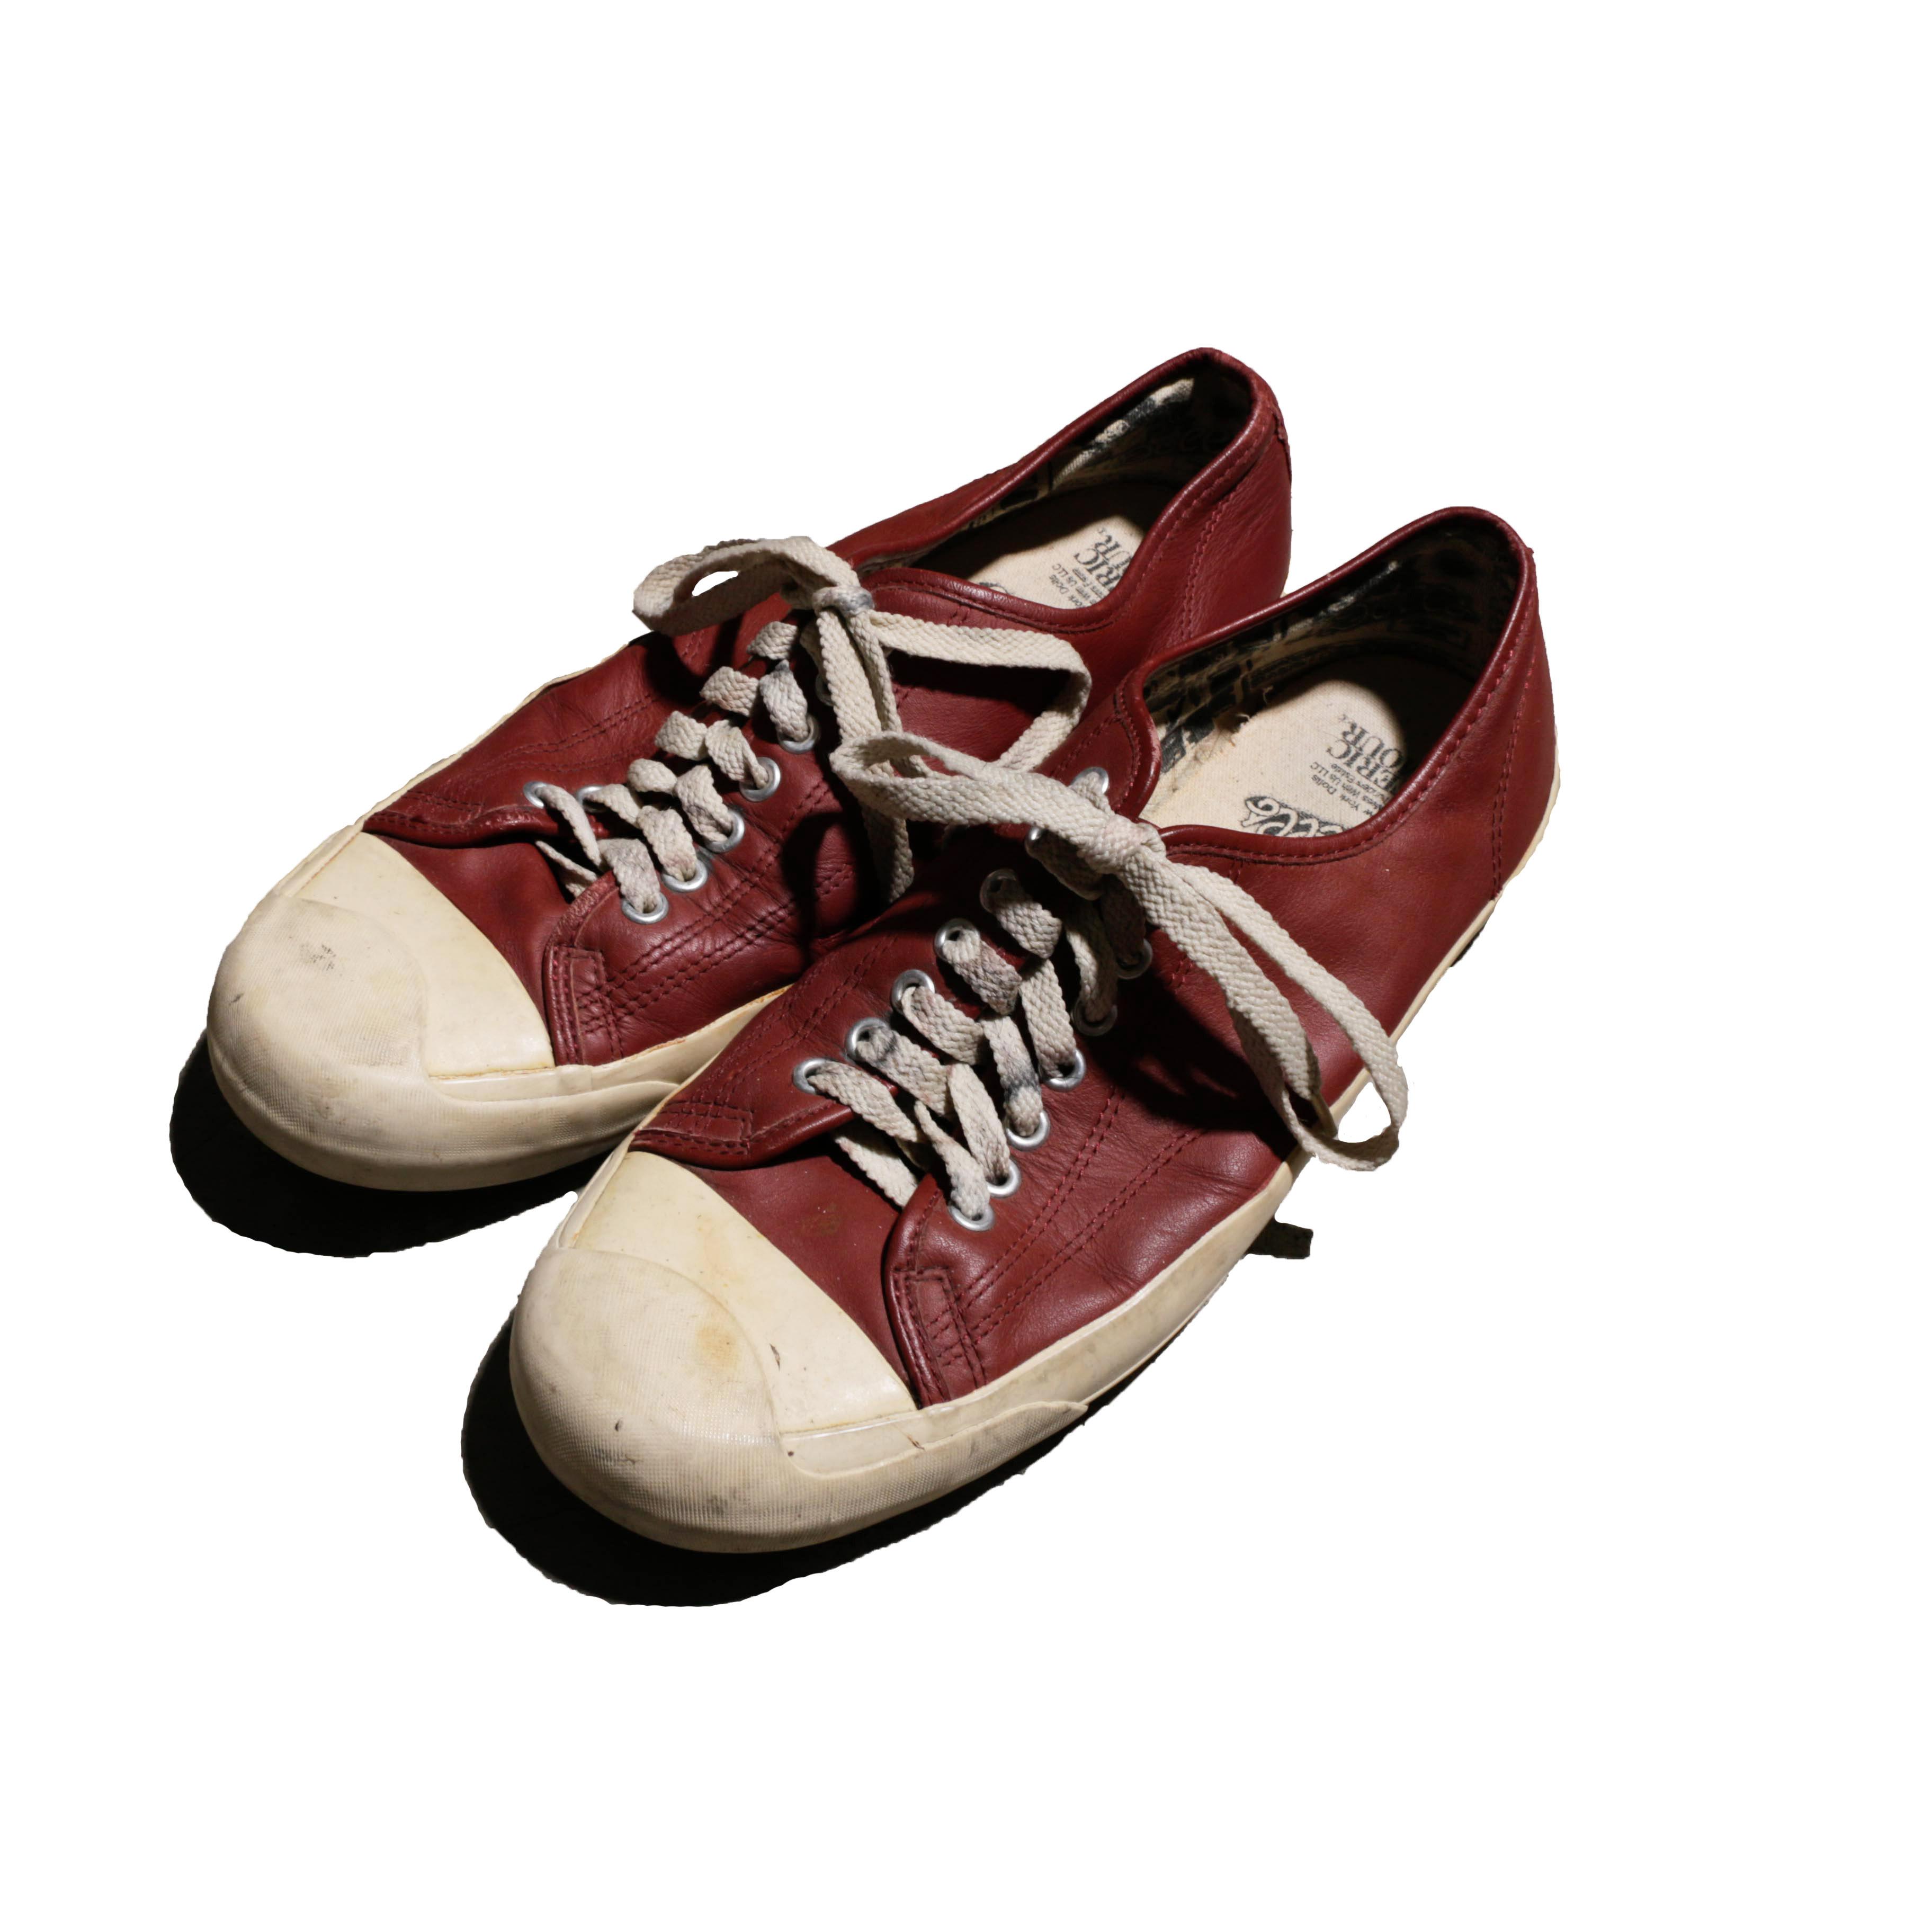 HystericGlamour NewYorkDolls LeatherSneaker